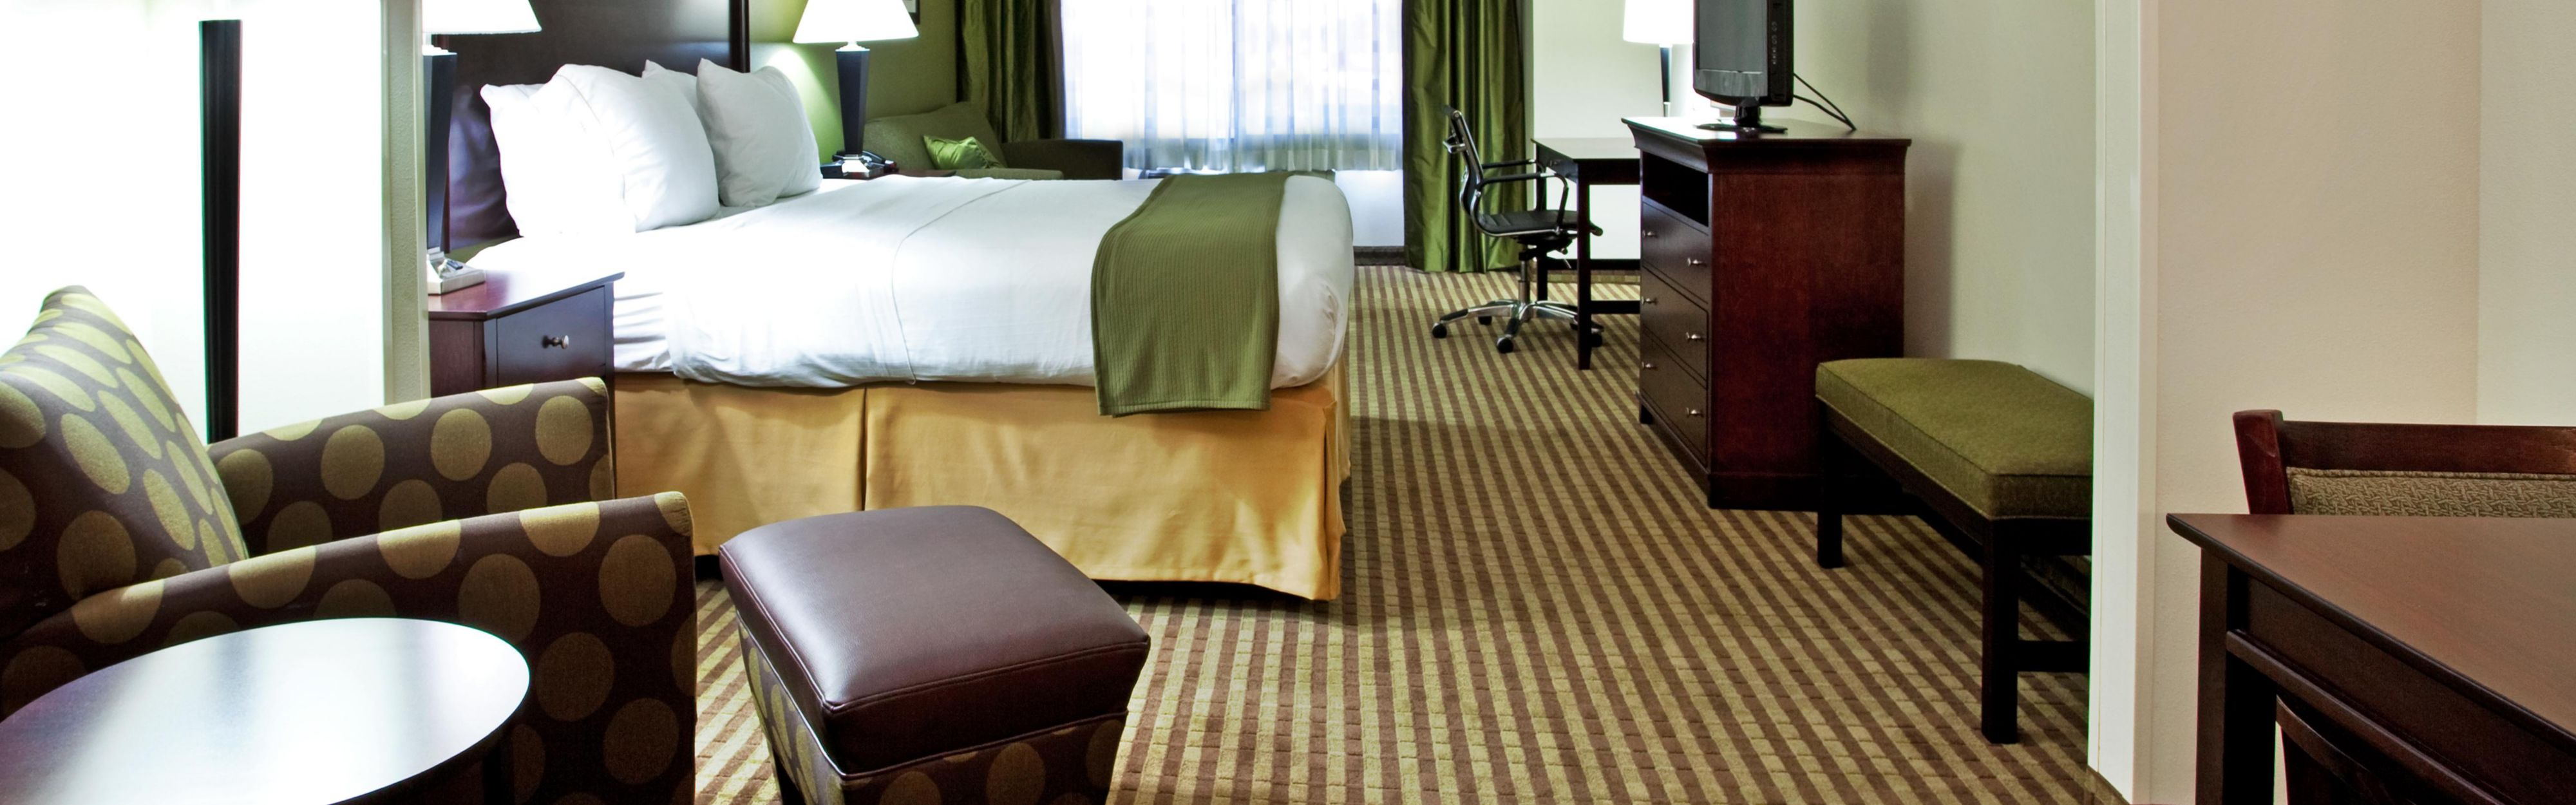 Holiday Inn Express & Suites Biloxi- Ocean Springs image 1